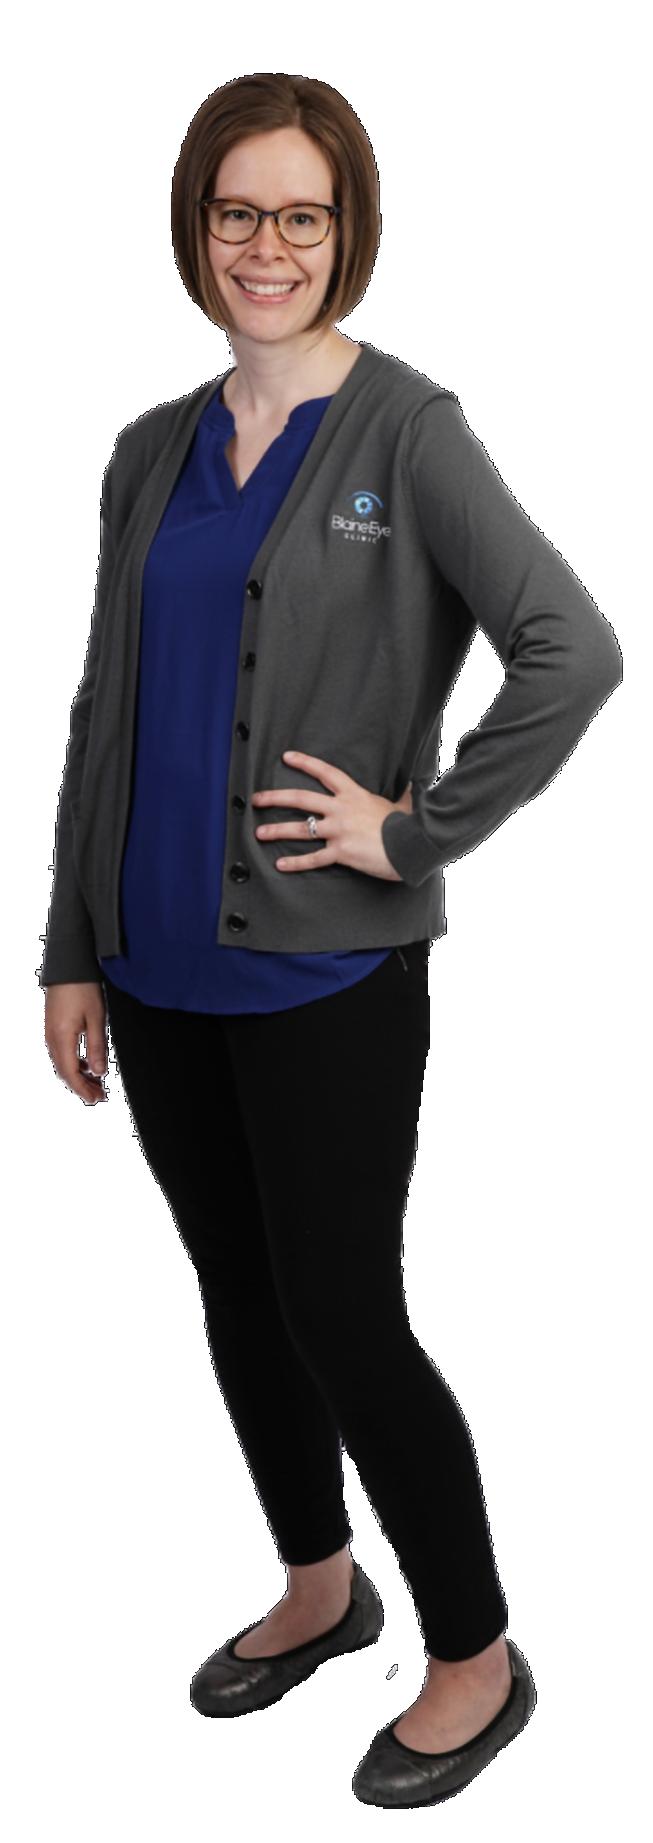 Blaine Eye Doctor Megan Sis, O.D.